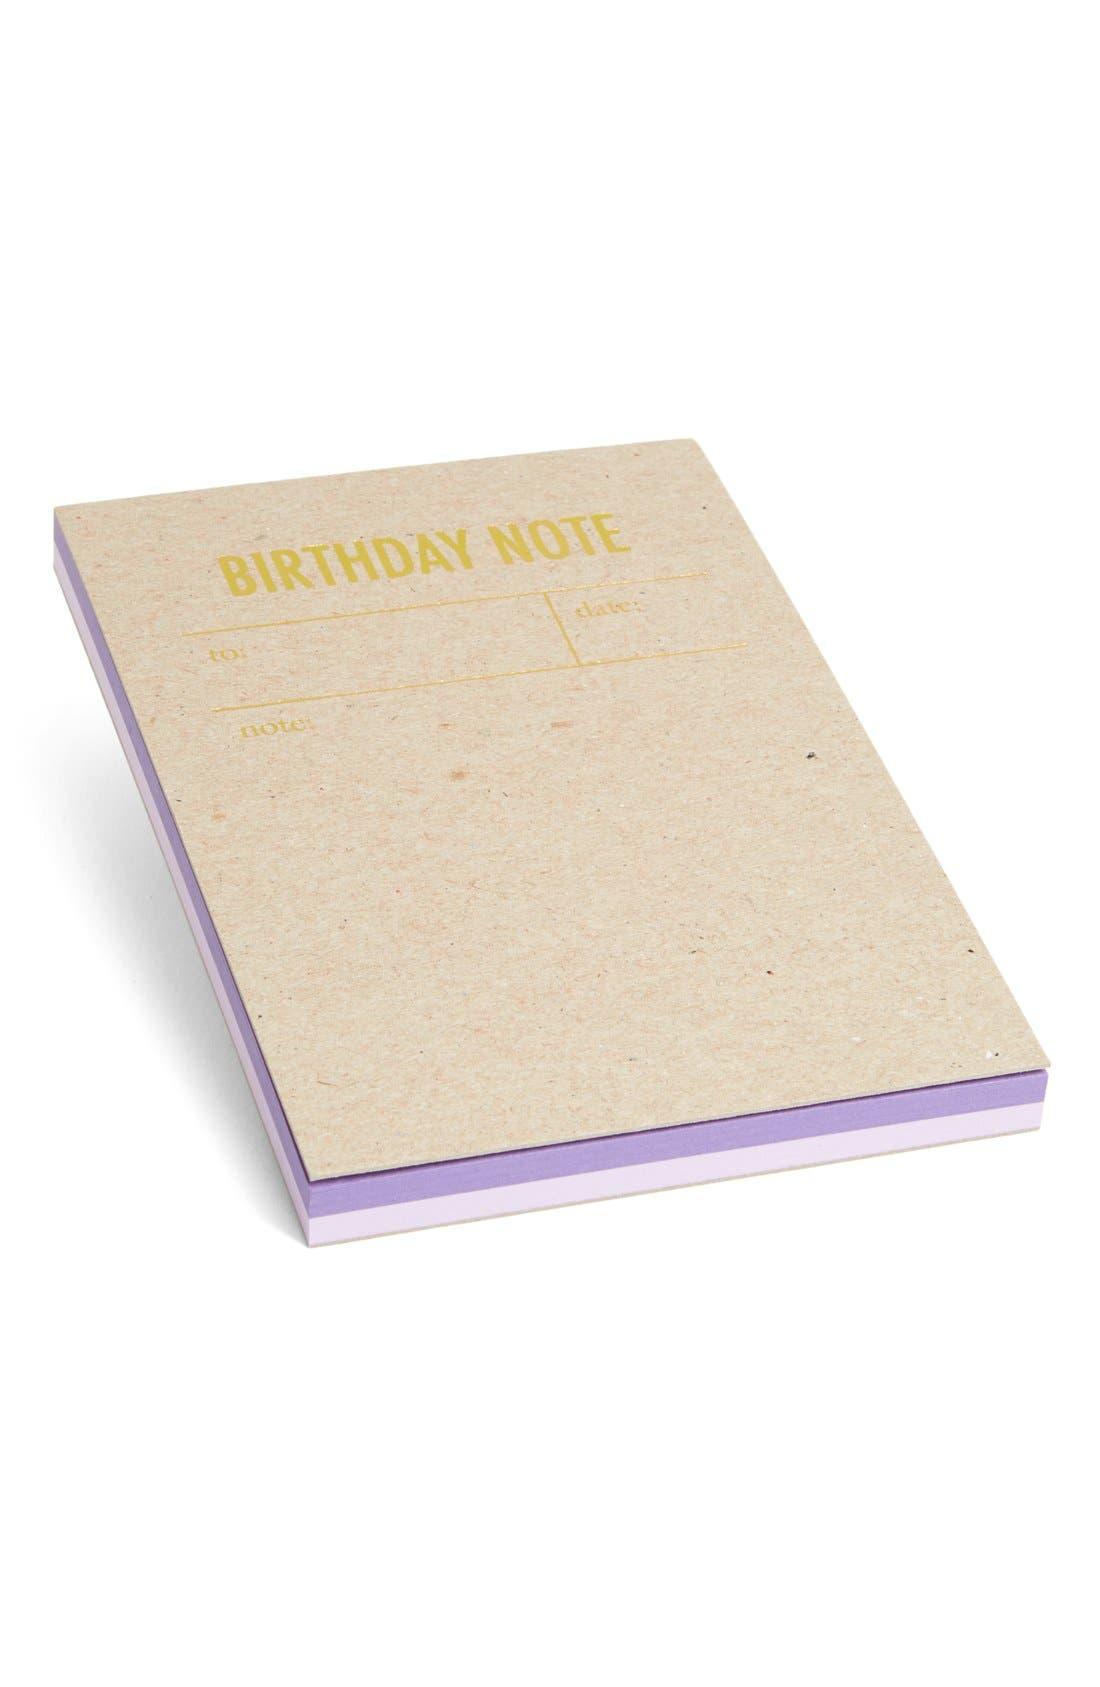 Main Image - Tokketok 'Birthday Note' Letterpress Note Cards (Set of 30)